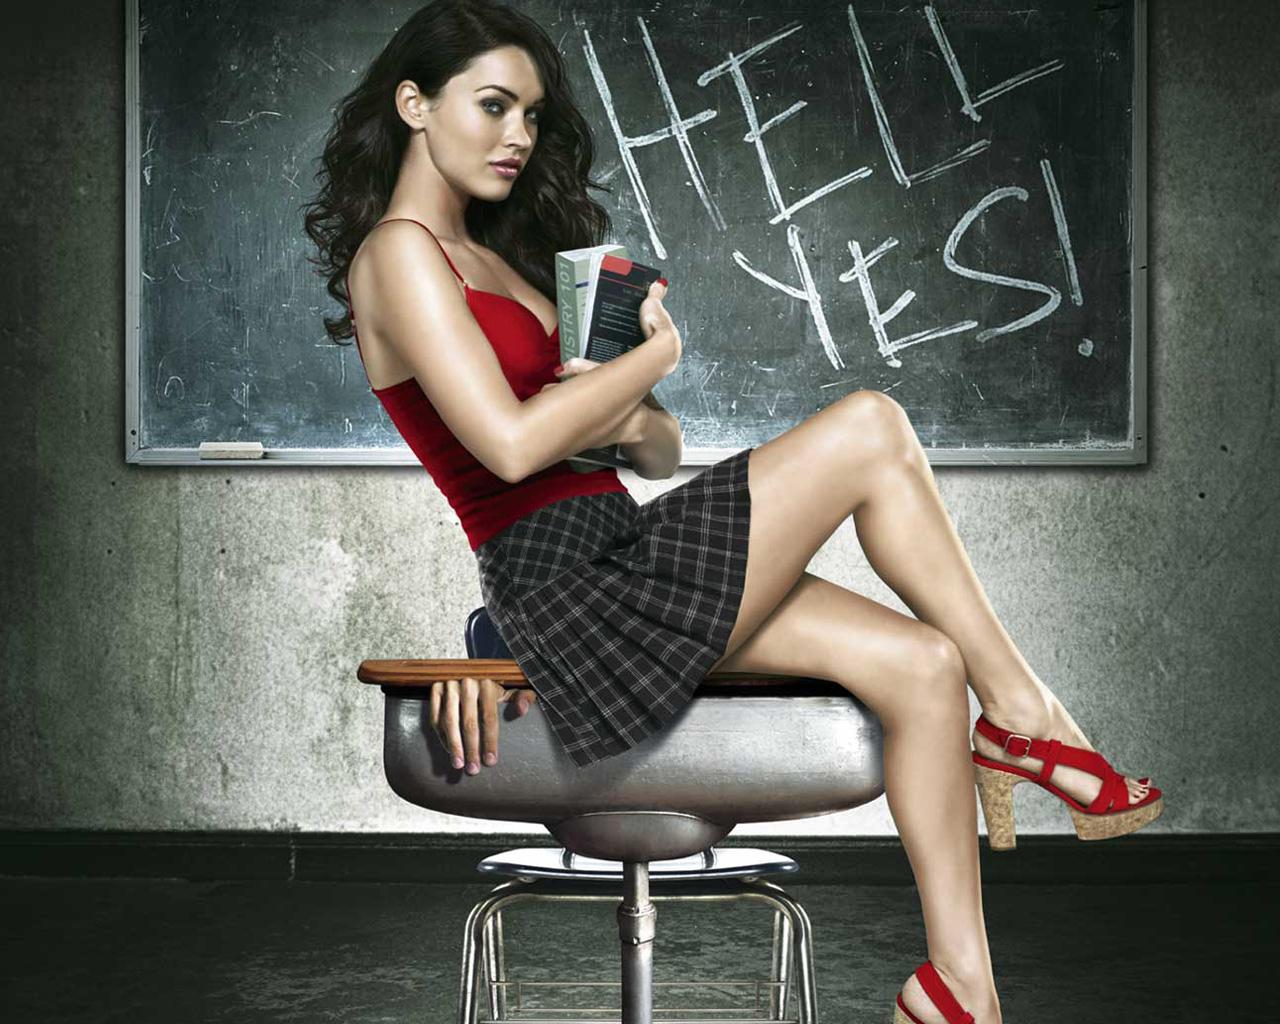 Megan Fox Sitting on Chair in Red & Black Dress 1